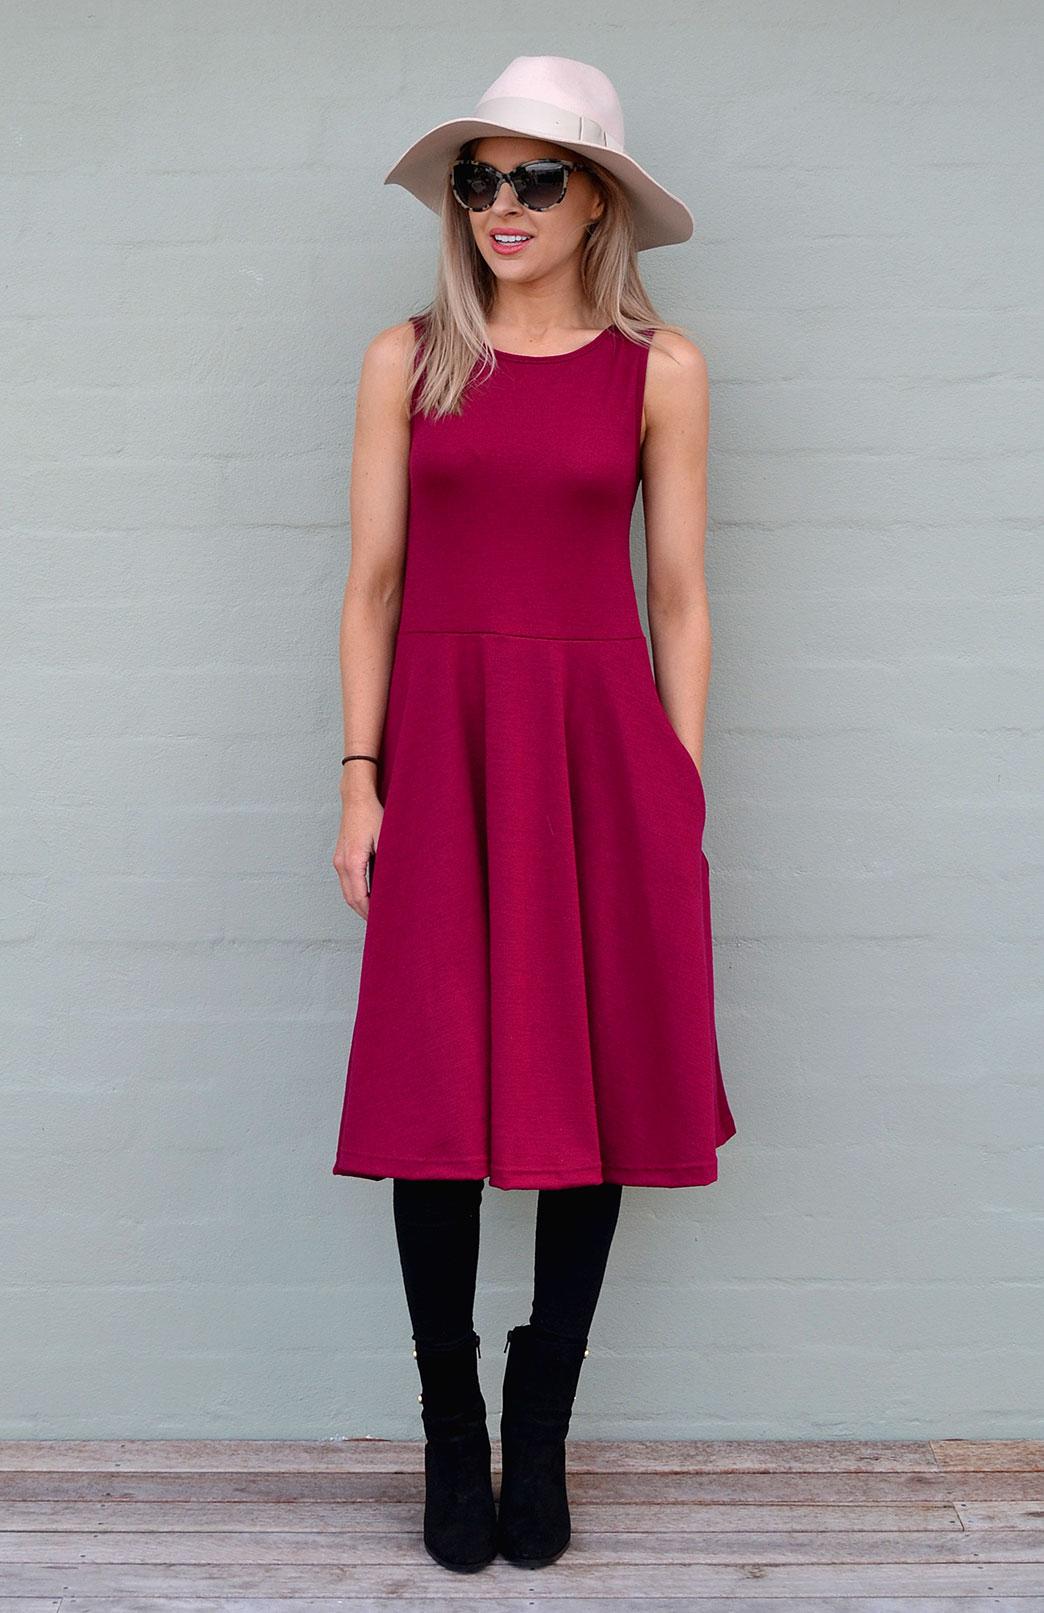 a32e05f9423ed MaryAnn Fit and Flare Dress - Women s Merino Wool Sleeveless Mary Dress  with Pockets - Smitten